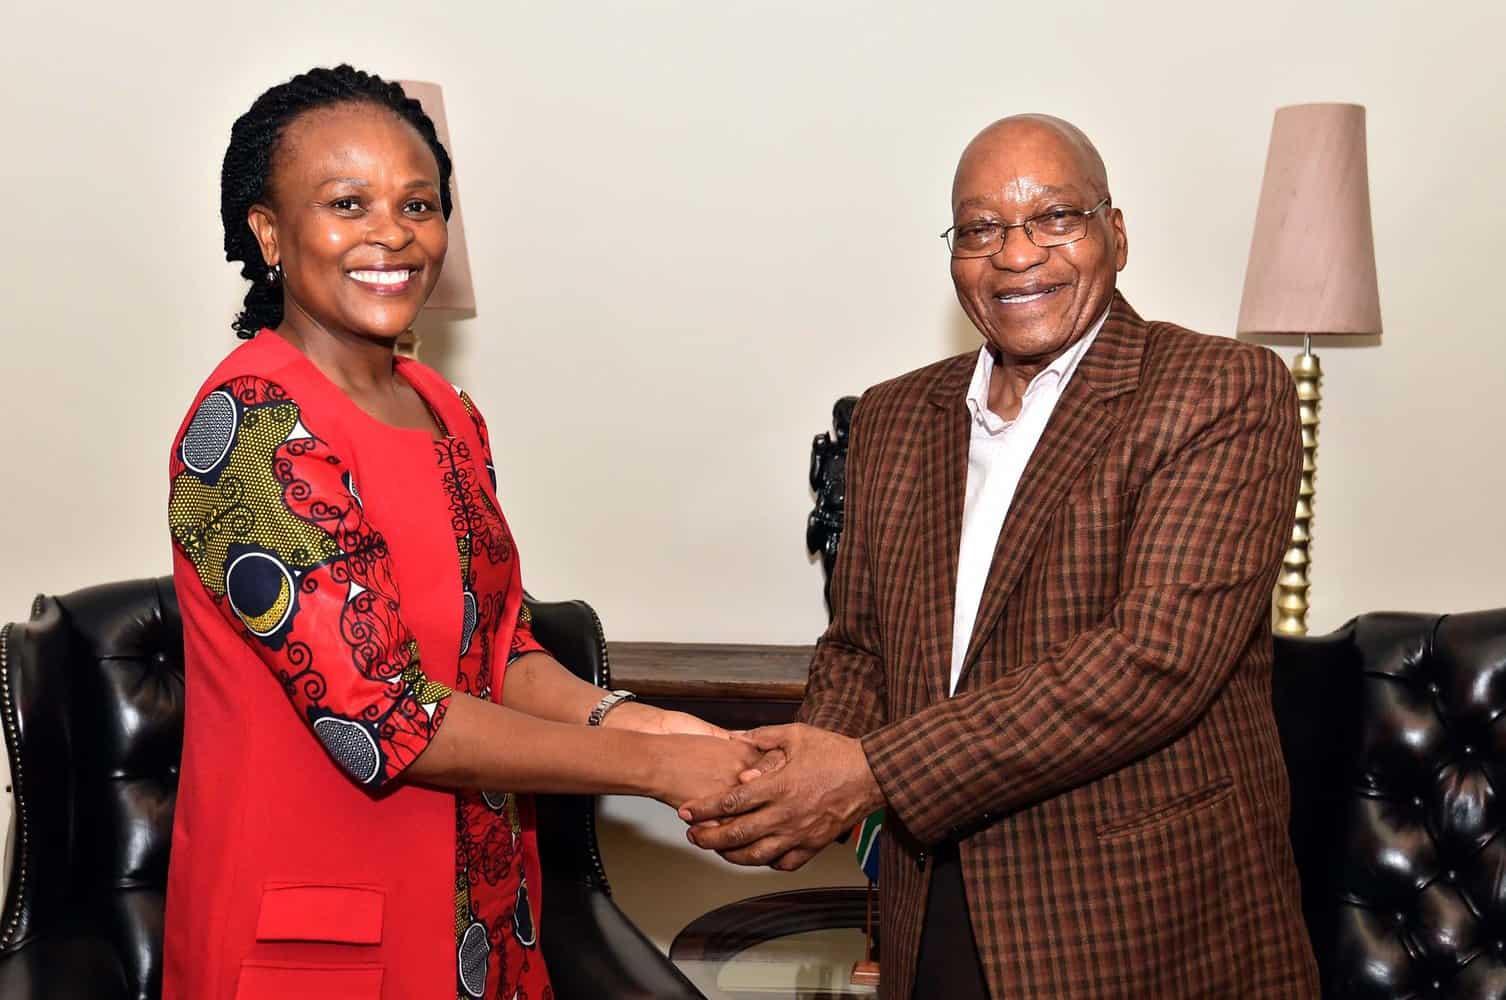 Former president Jacob Zuma and Public Protector Busisiwe Mkhwebane